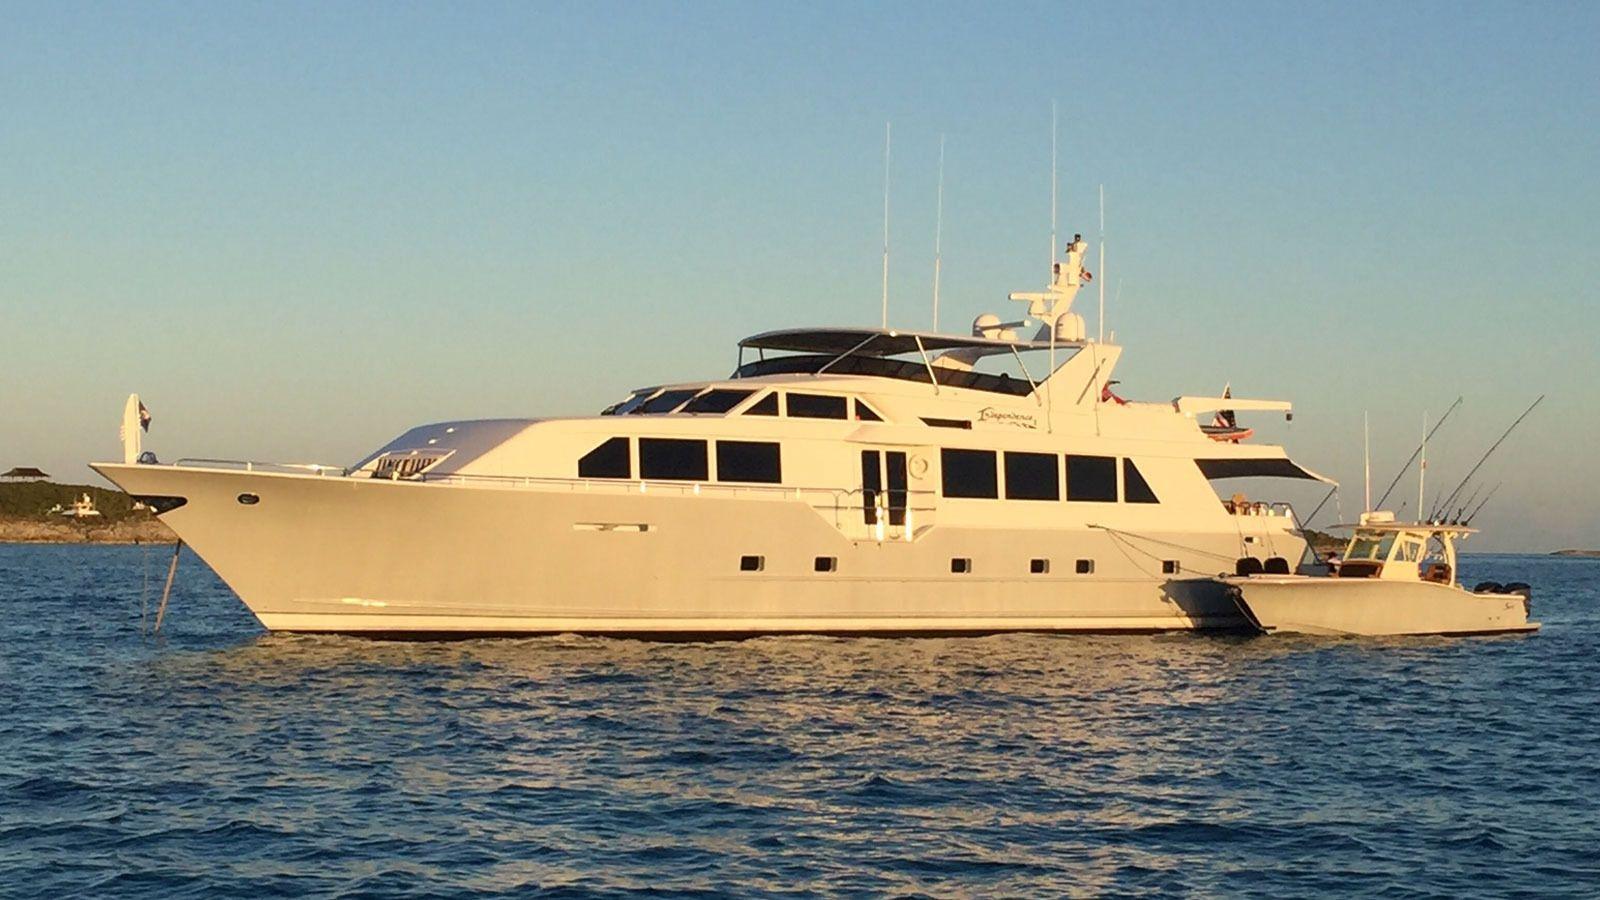 INDEPENDENCE 3 - Broward Marine 35m - 4 Cabins - Bahamas